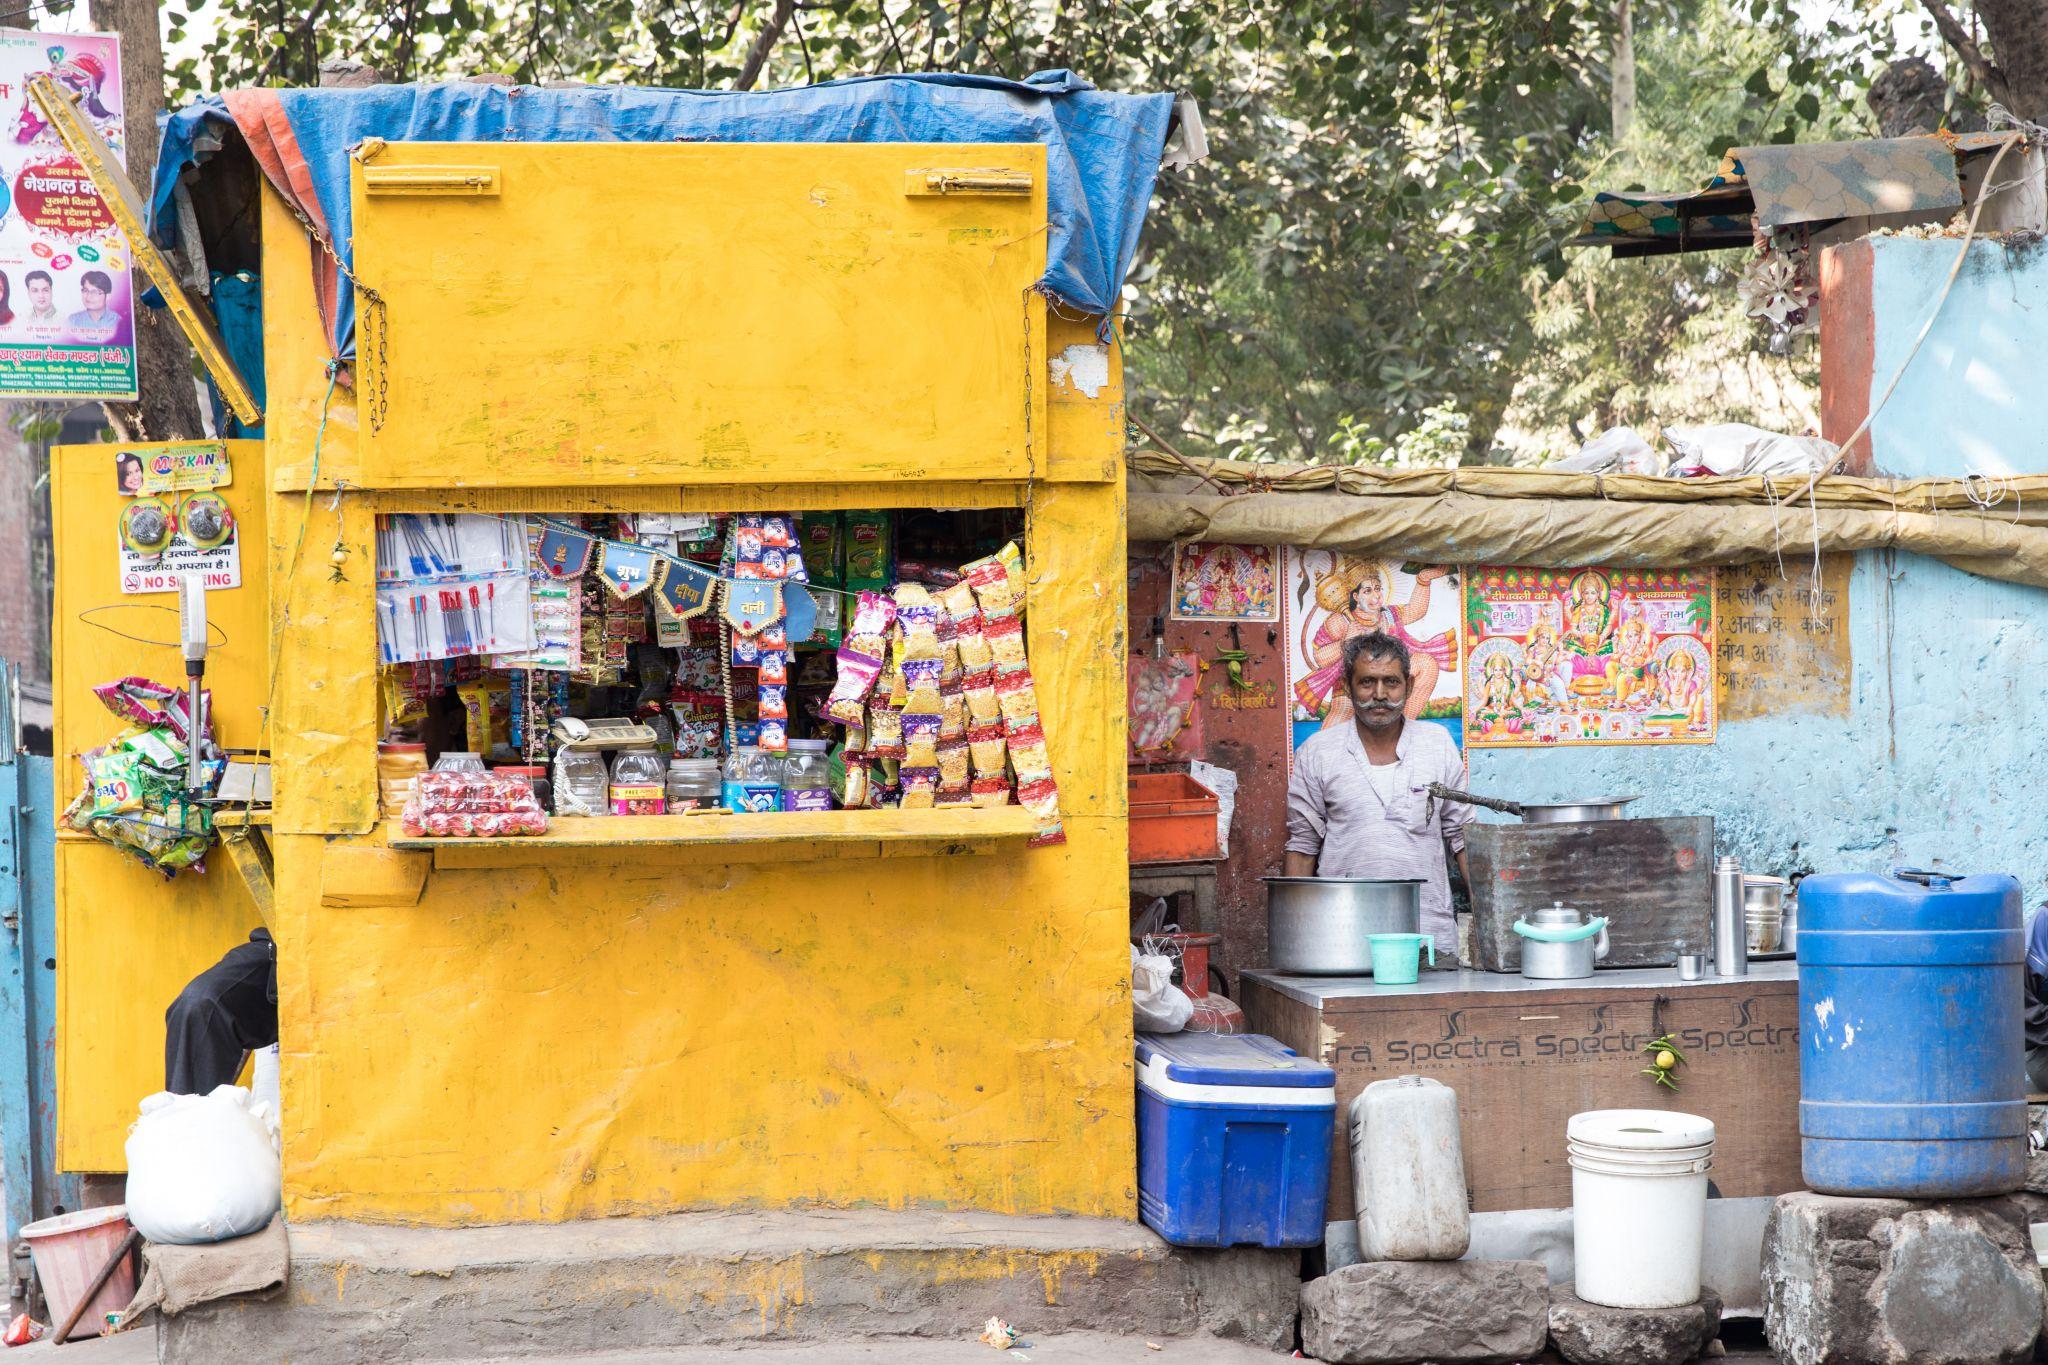 Spice Market, India